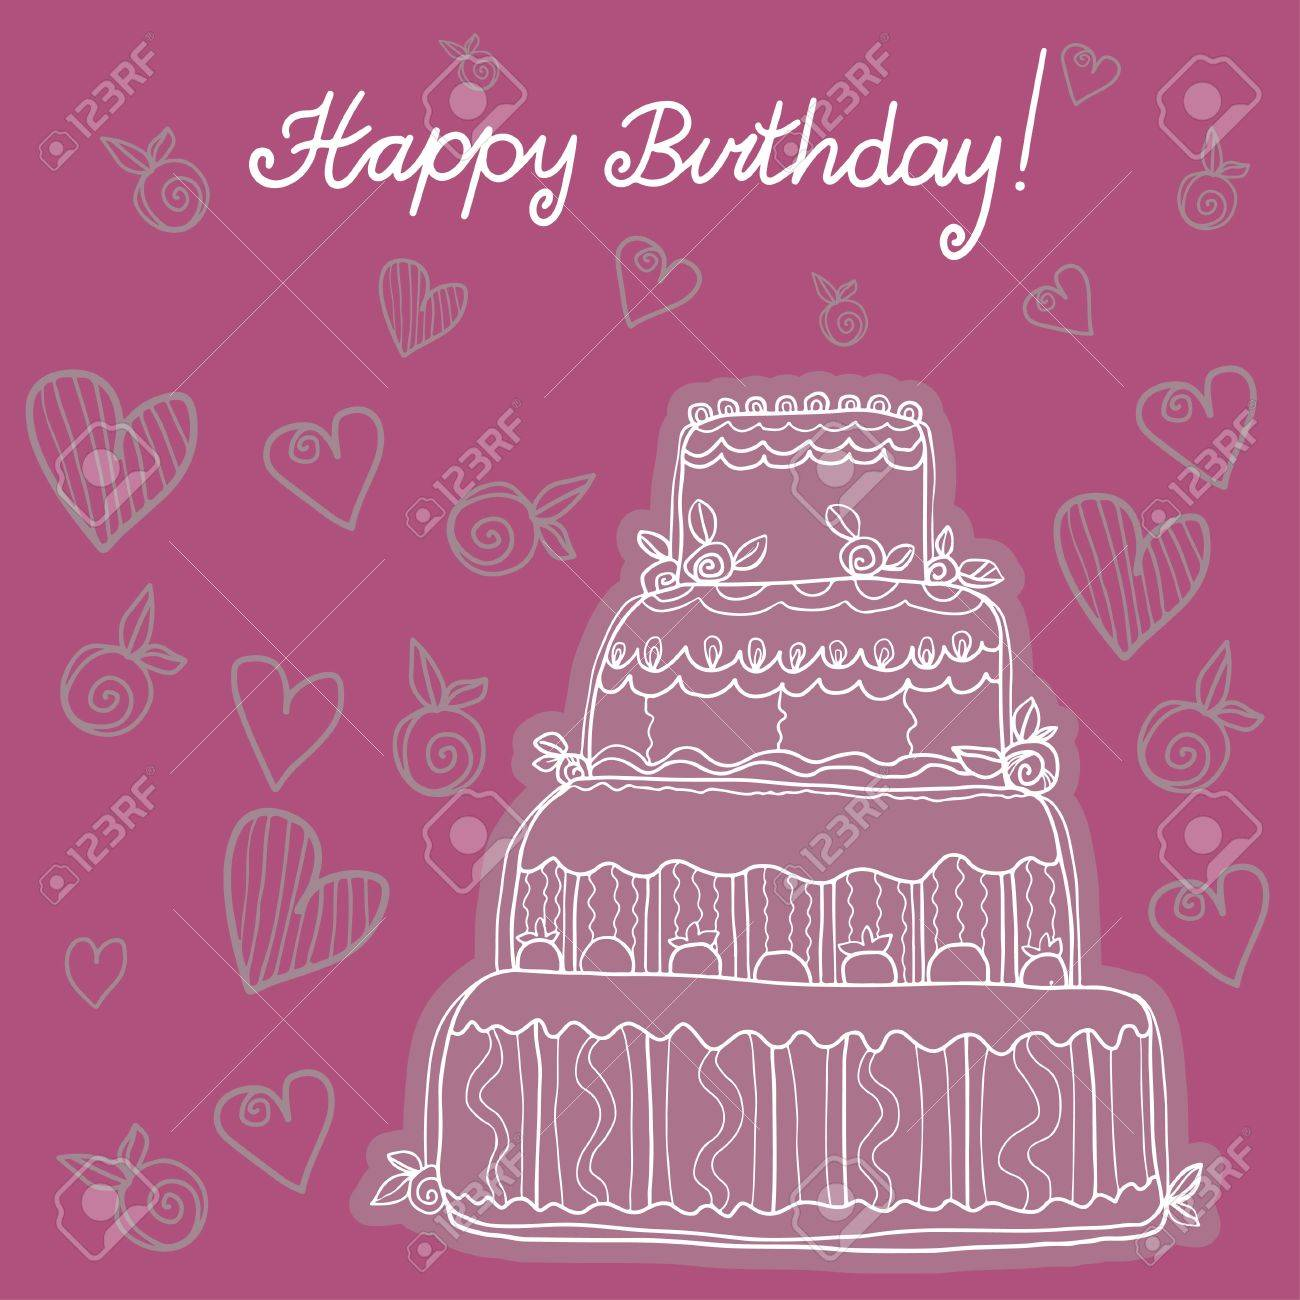 Happy Birthday Background With Birthday Cake Royalty Free Cliparts